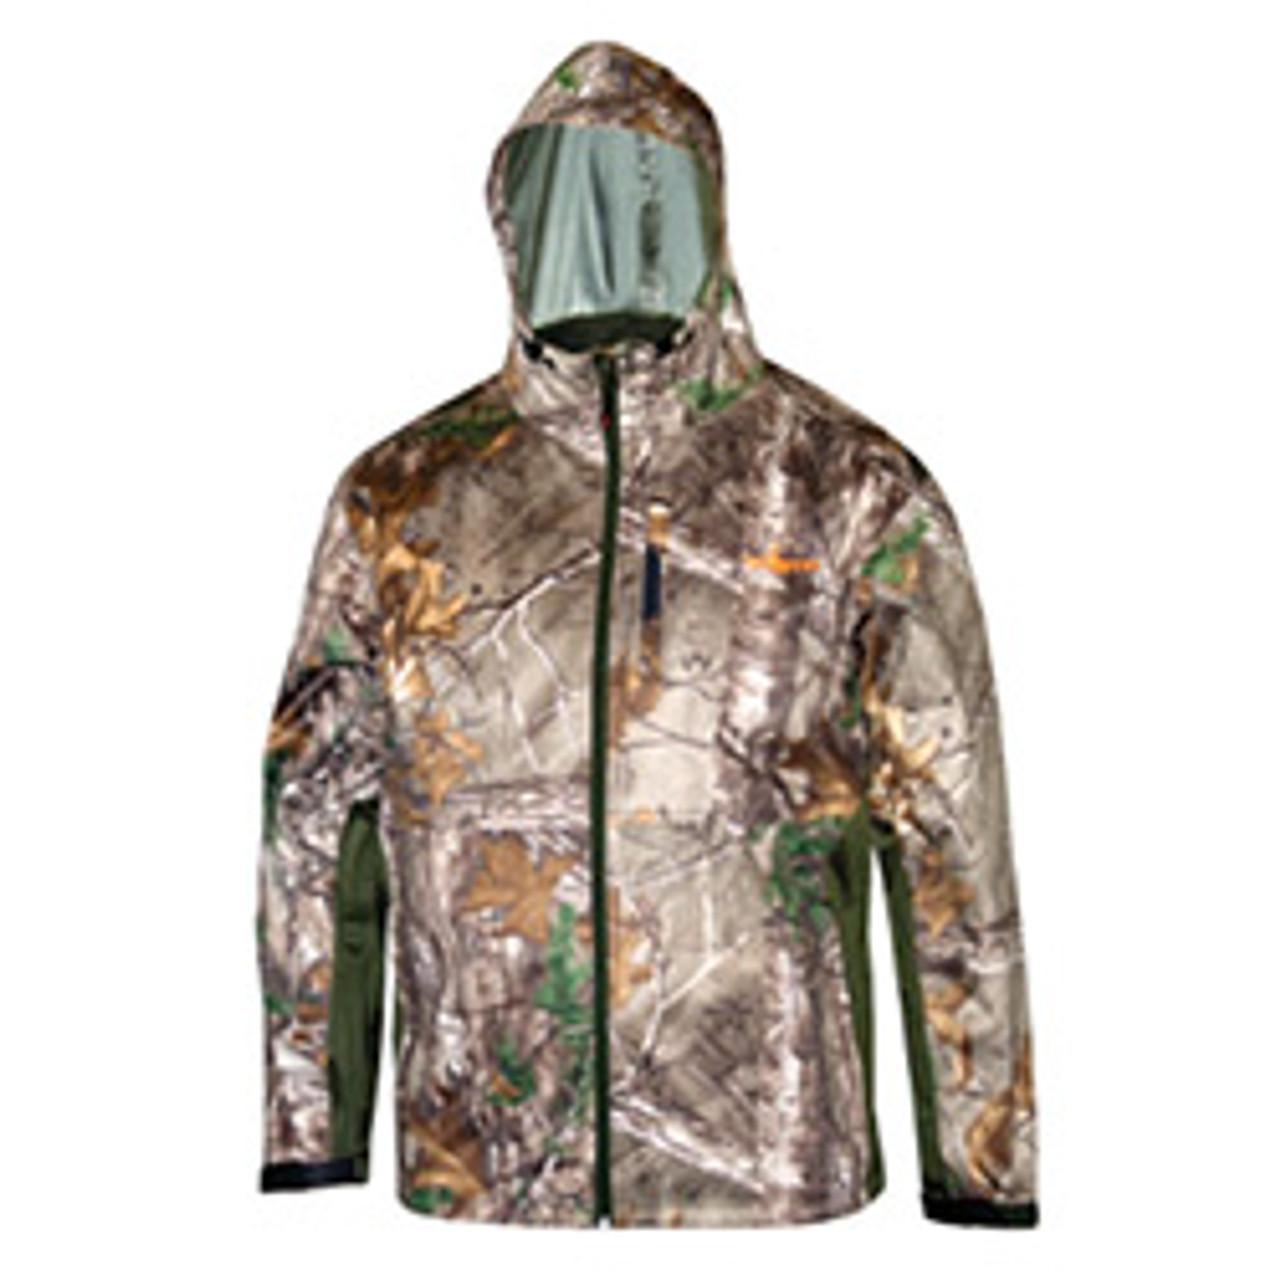 Silver Grove Climate Shell Waterproof Jacket by Habit Apparel